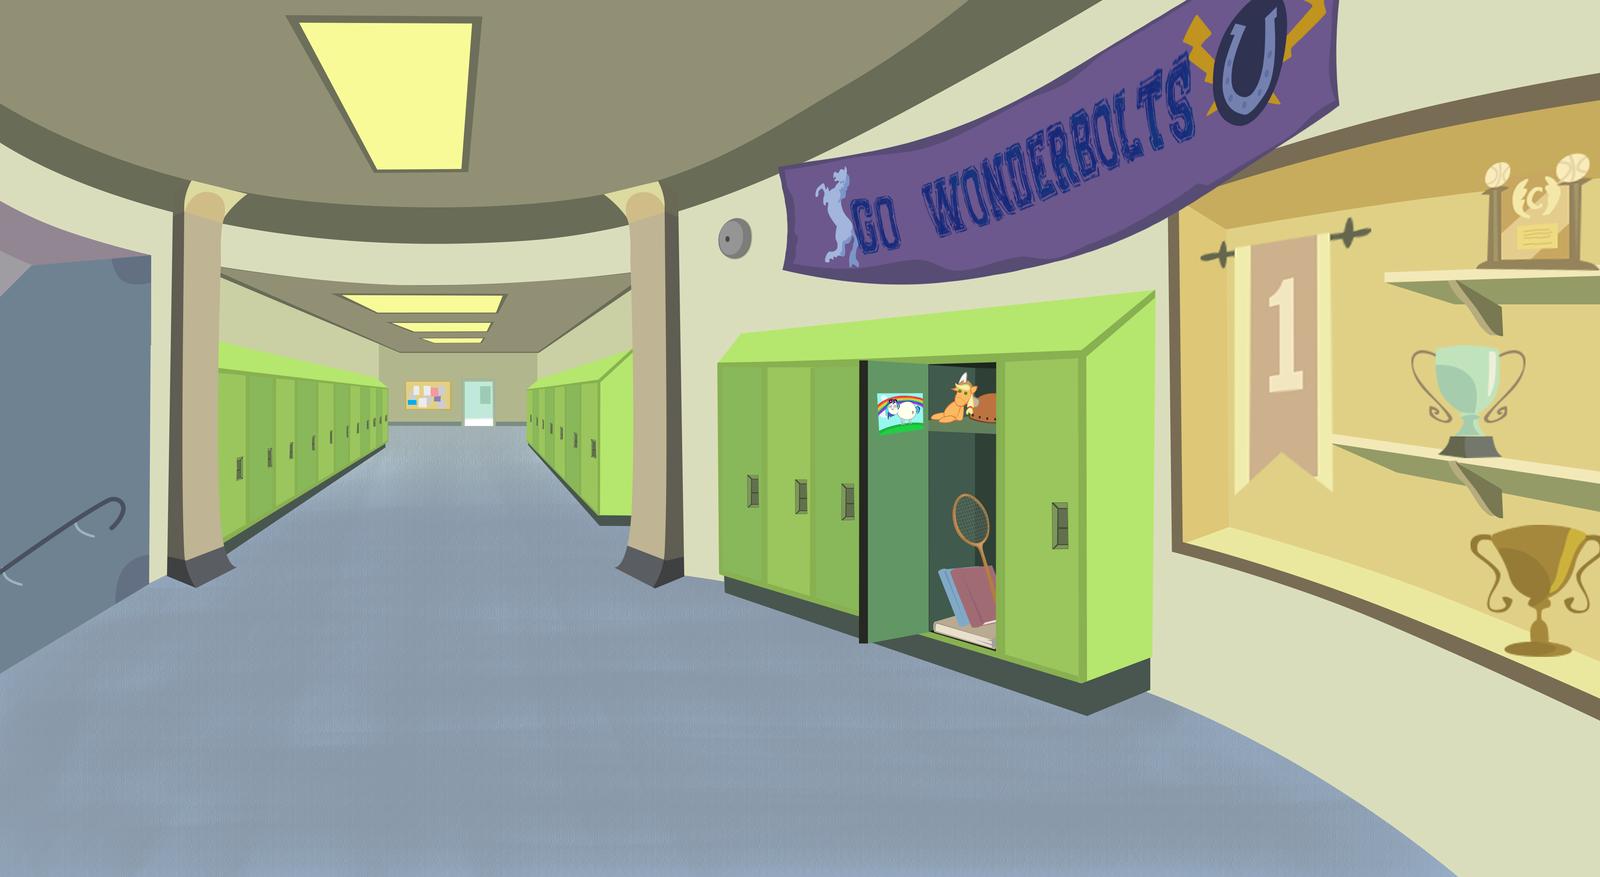 school hallway clip art - photo #14